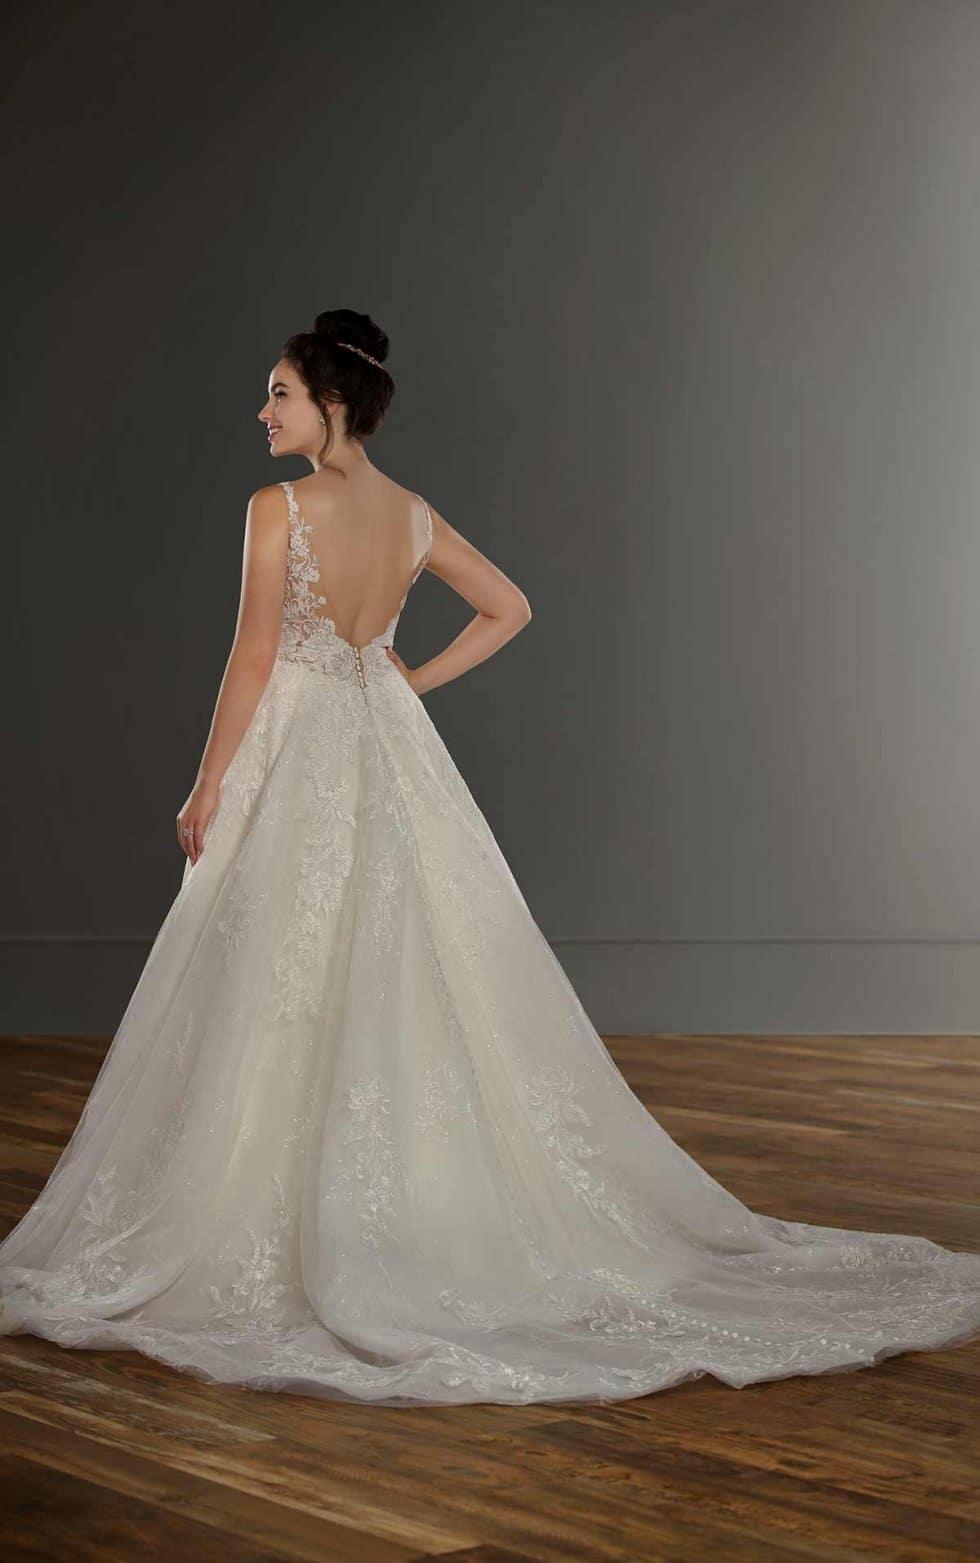 Martina Liana Dresses at Shropshire Country Brides